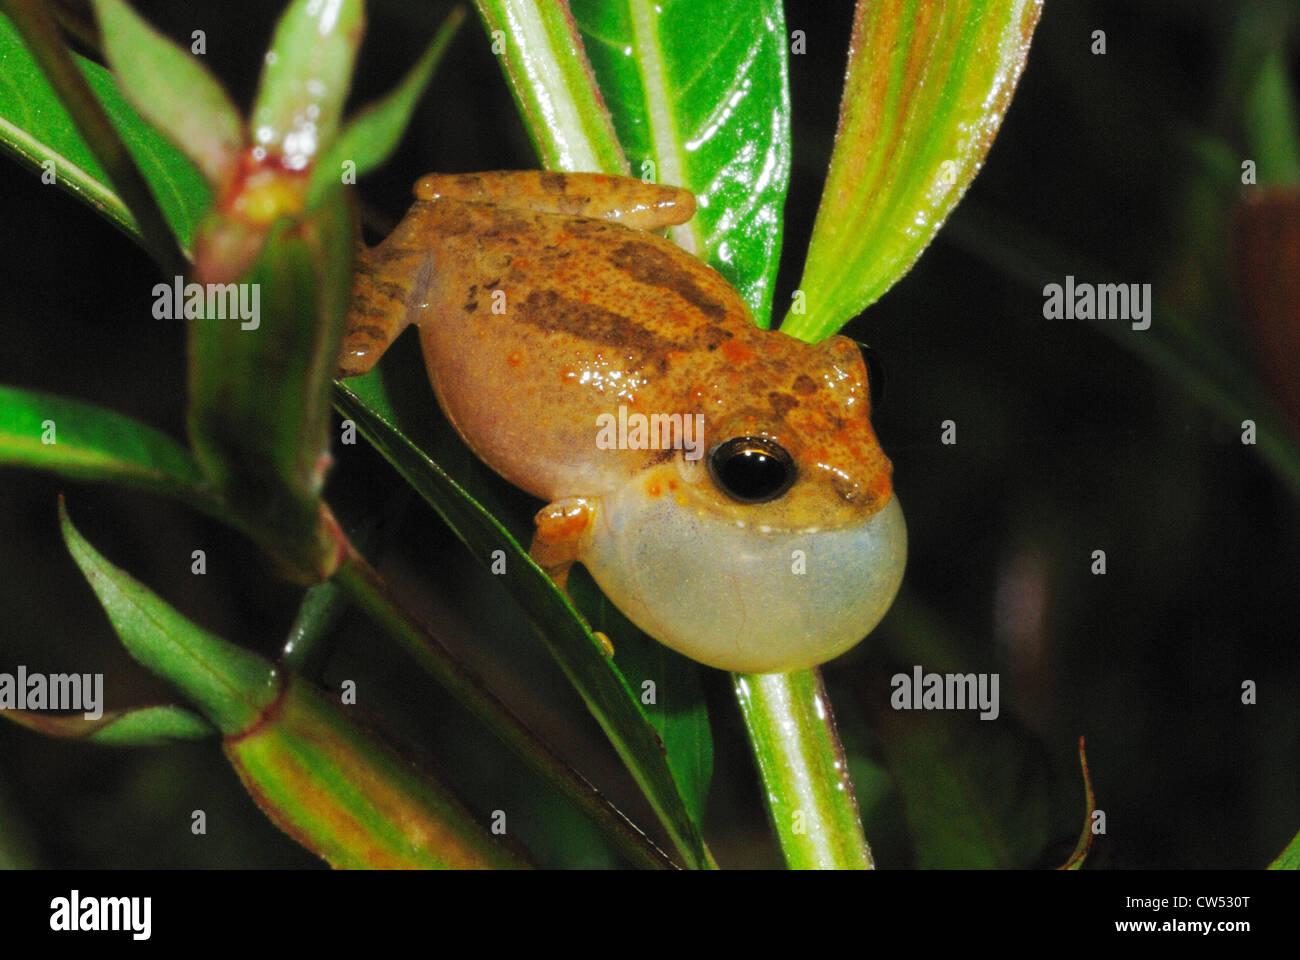 Common Shrub Frog (Philautus popularis) calling in the Sinharaja Rain Forest, Sri Lanka - Stock Image